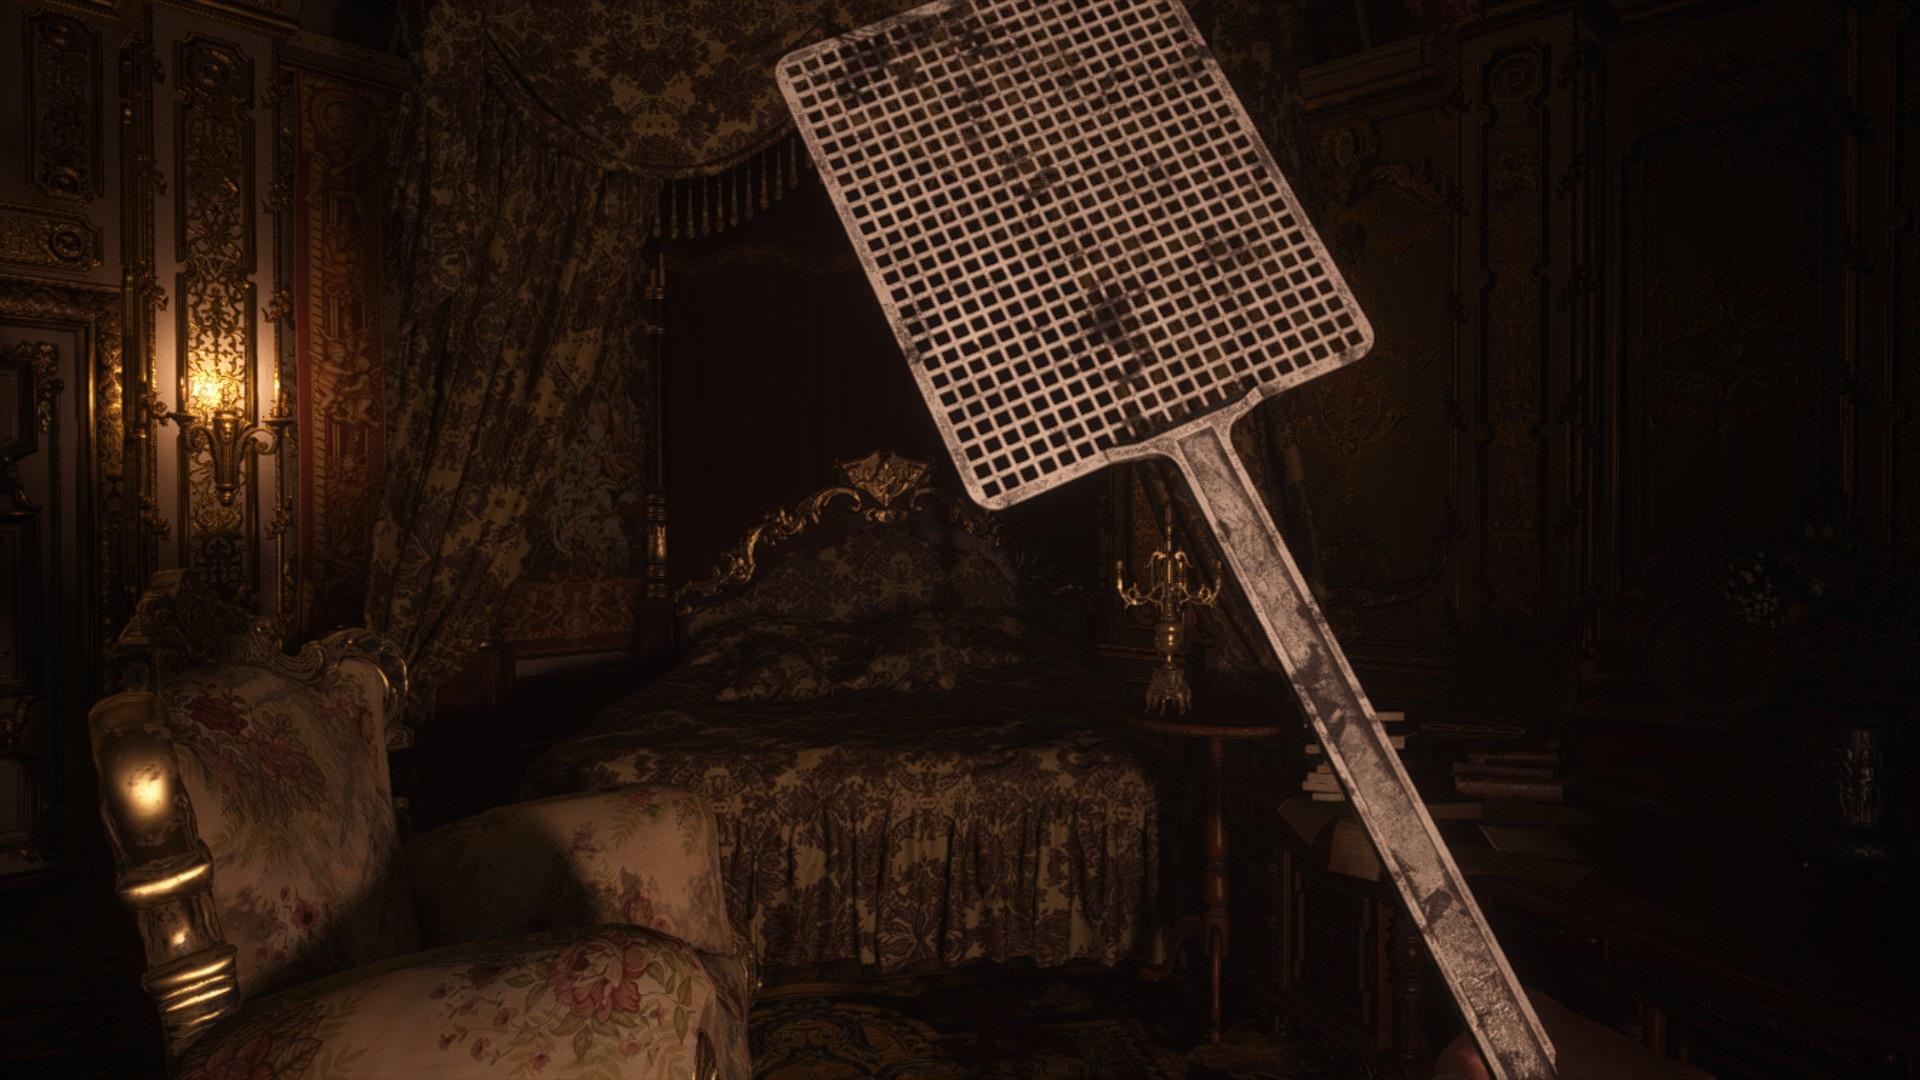 Modded resident evil village to make the knife a flyswatter